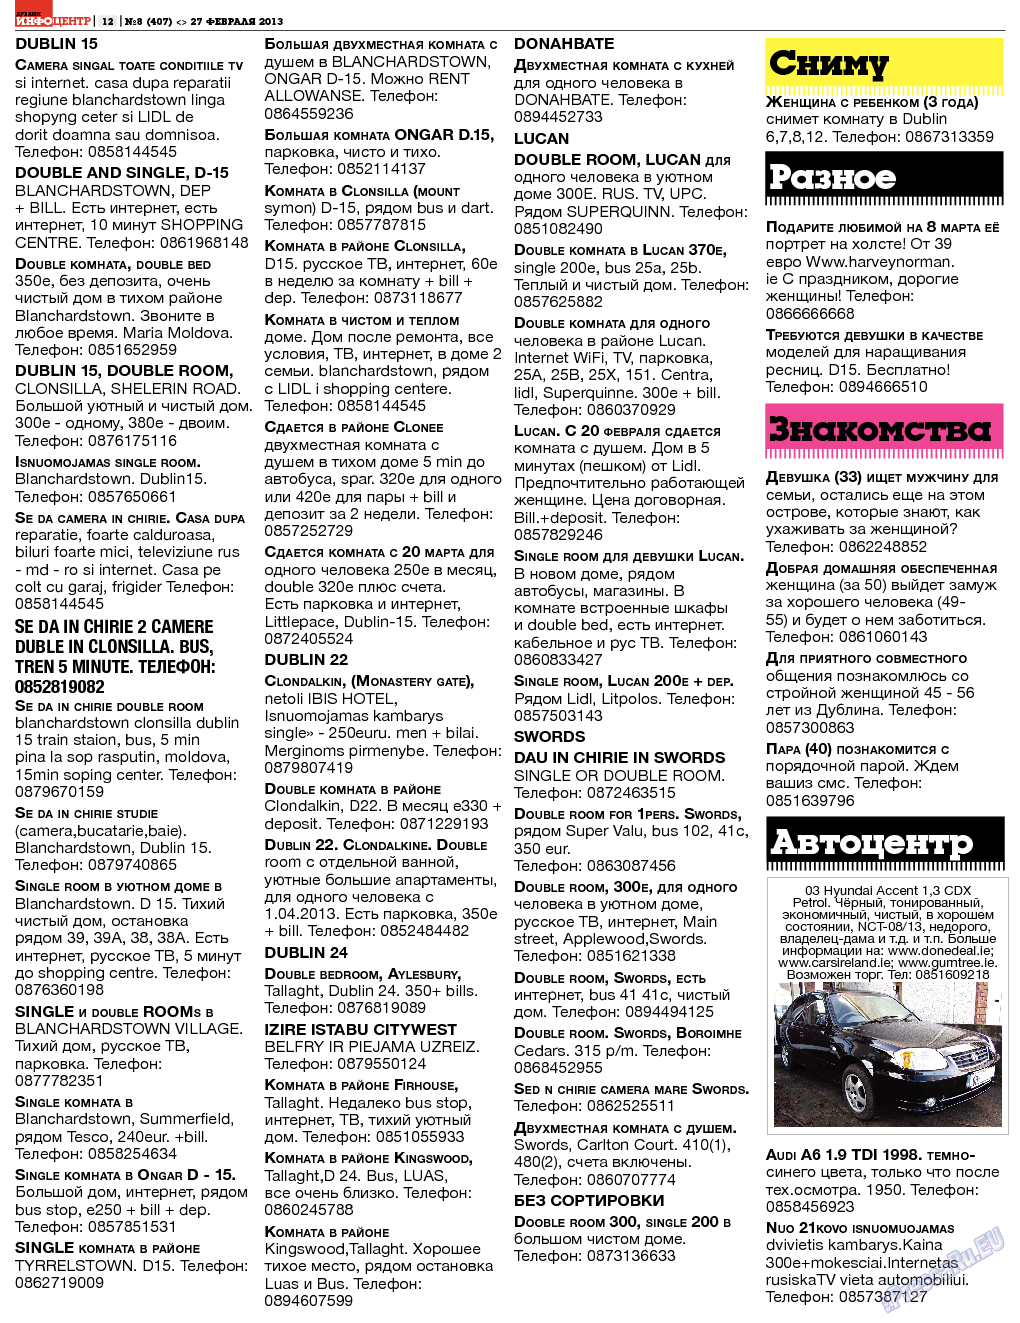 Дублин инфоцентр (газета). 2013 год, номер 8, стр. 12